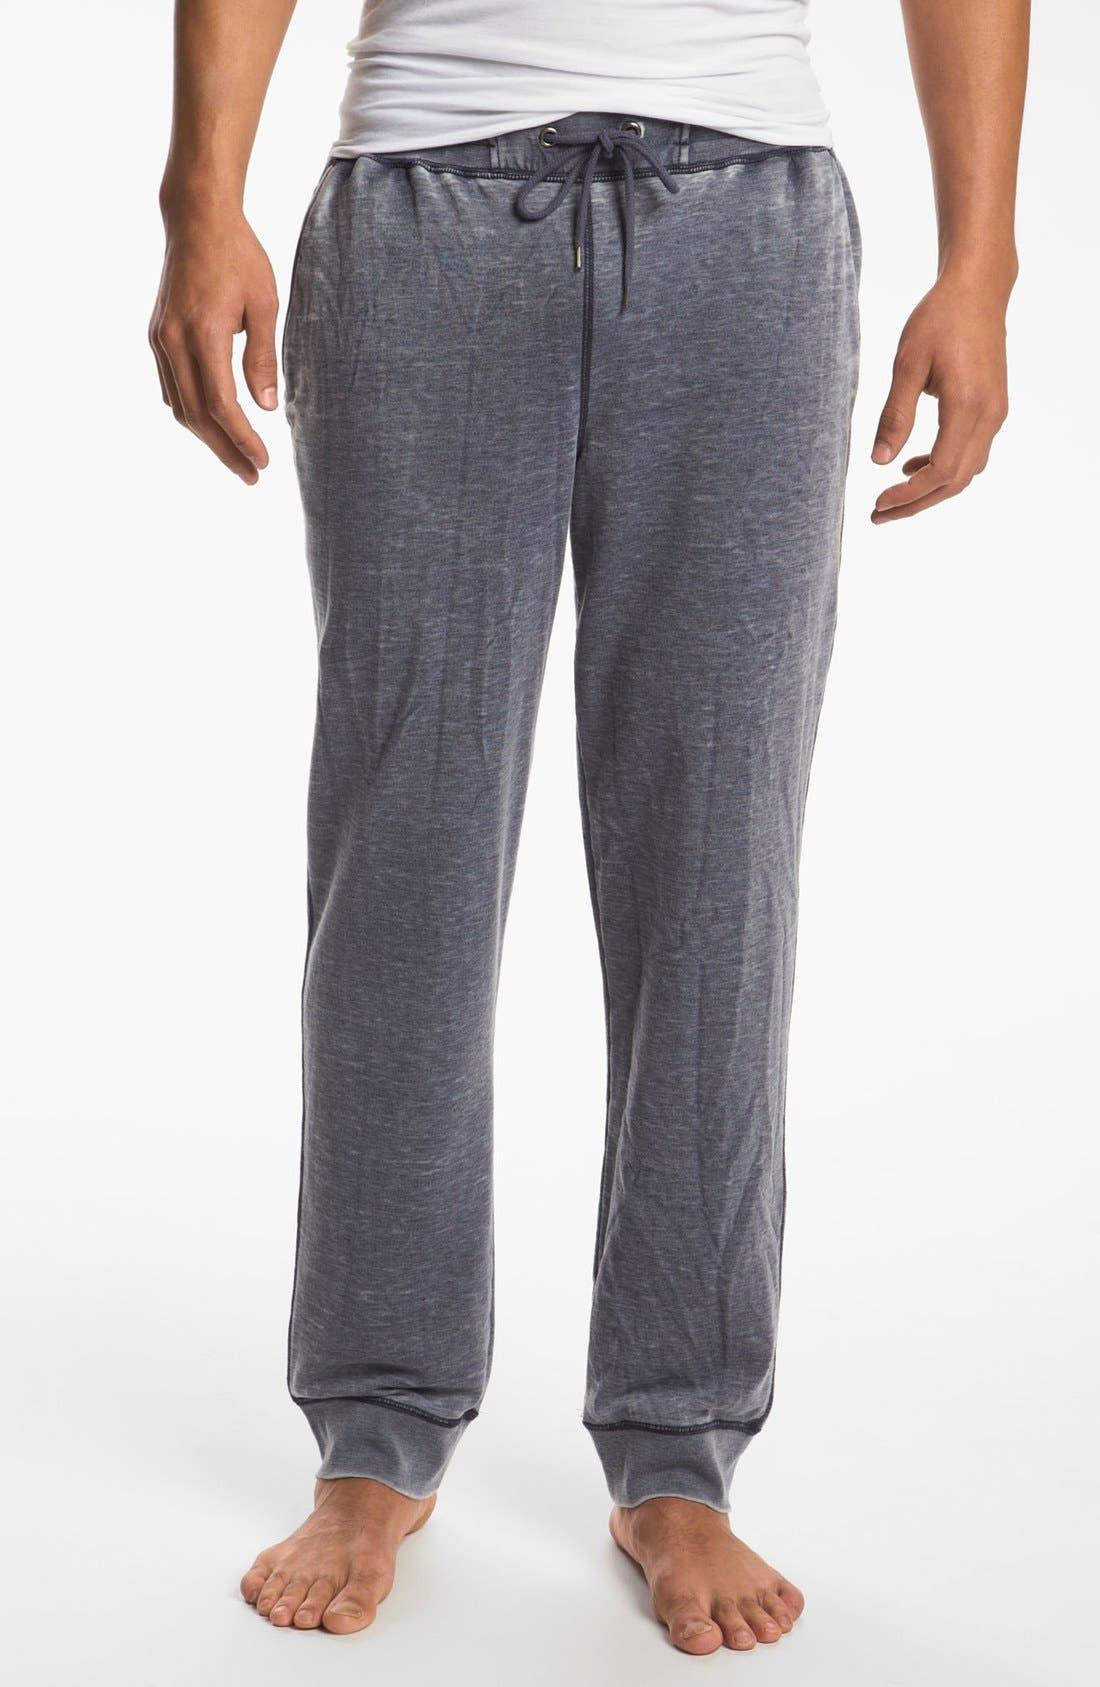 Alternate Image 1 Selected - Daniel Buchler Cotton & Polyester Lounge Pants